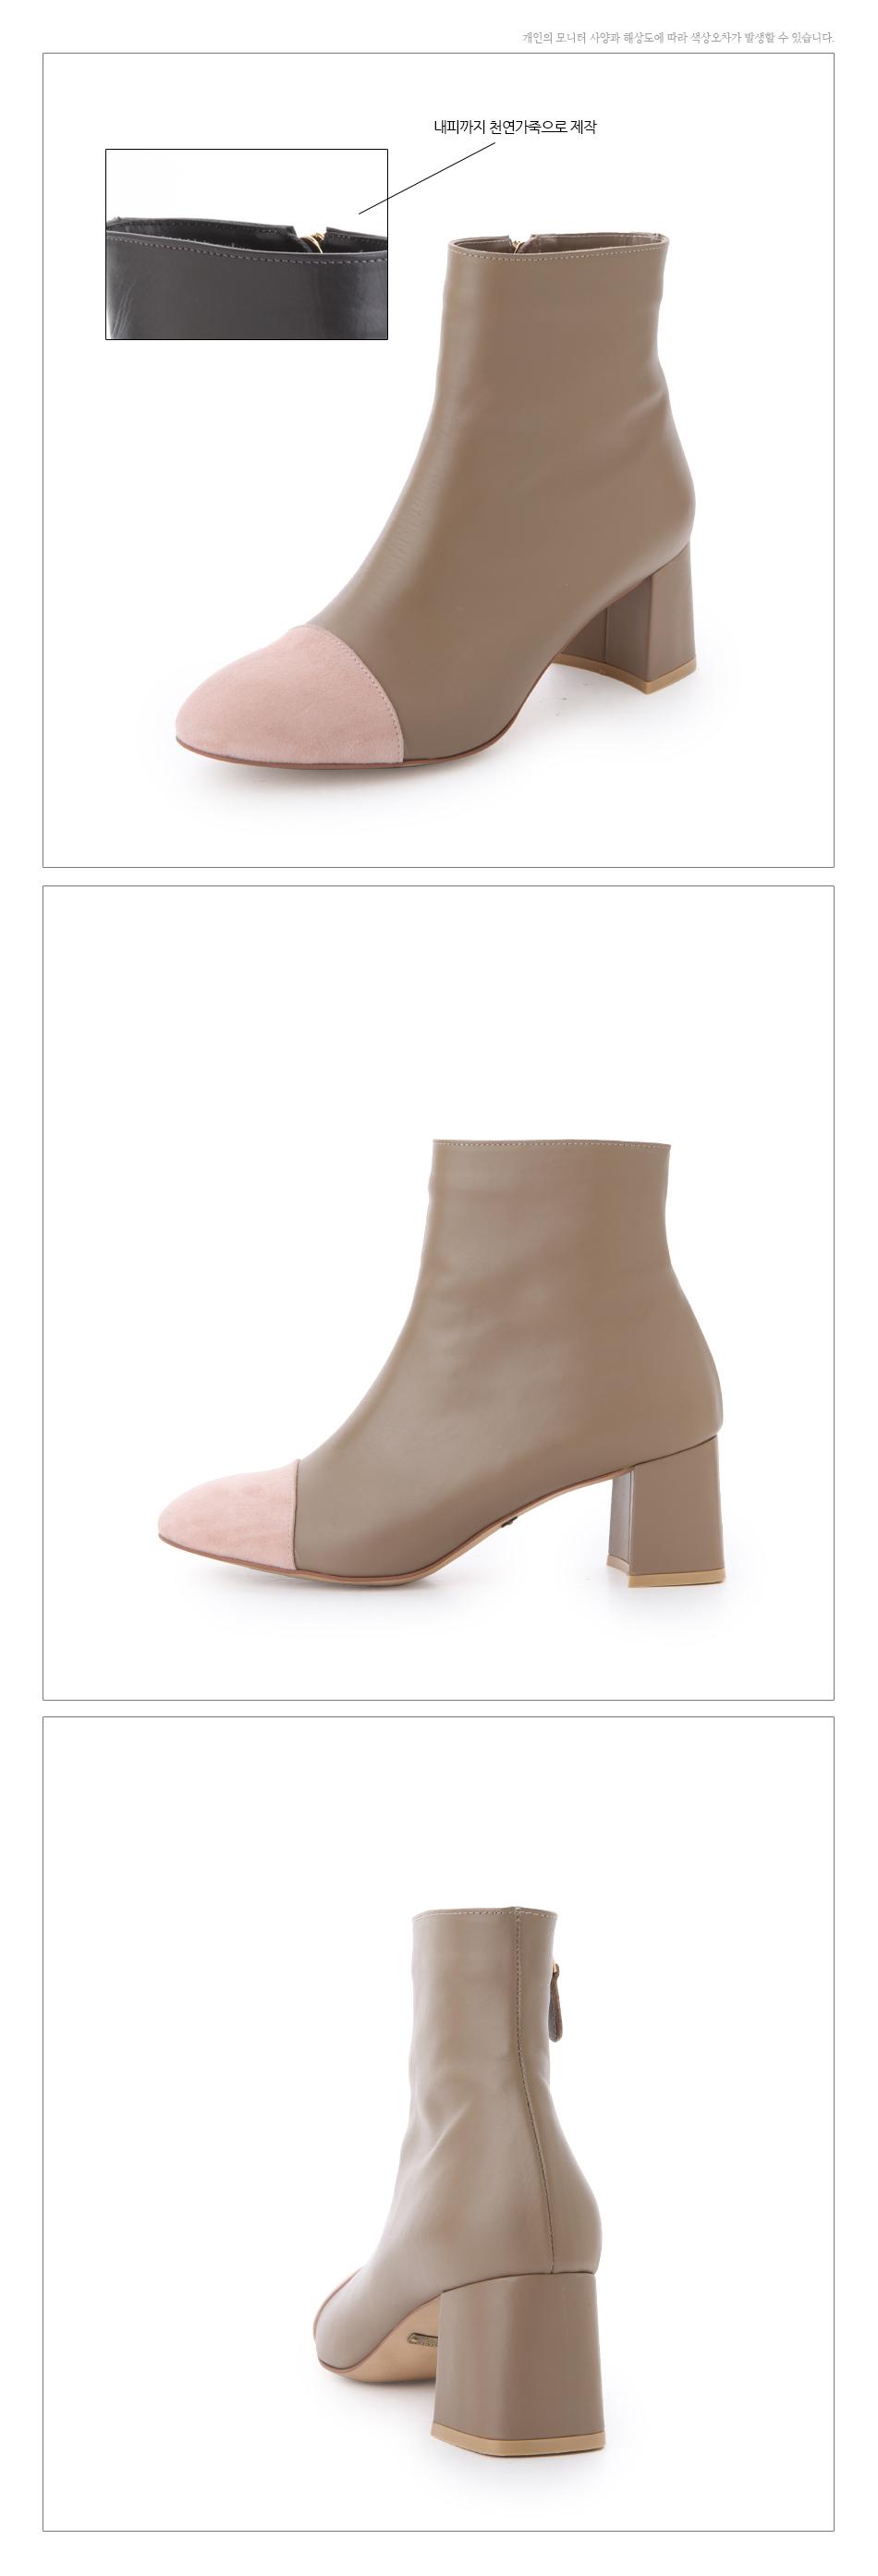 Boots Nữ Thiết Kế  6cm - GB966